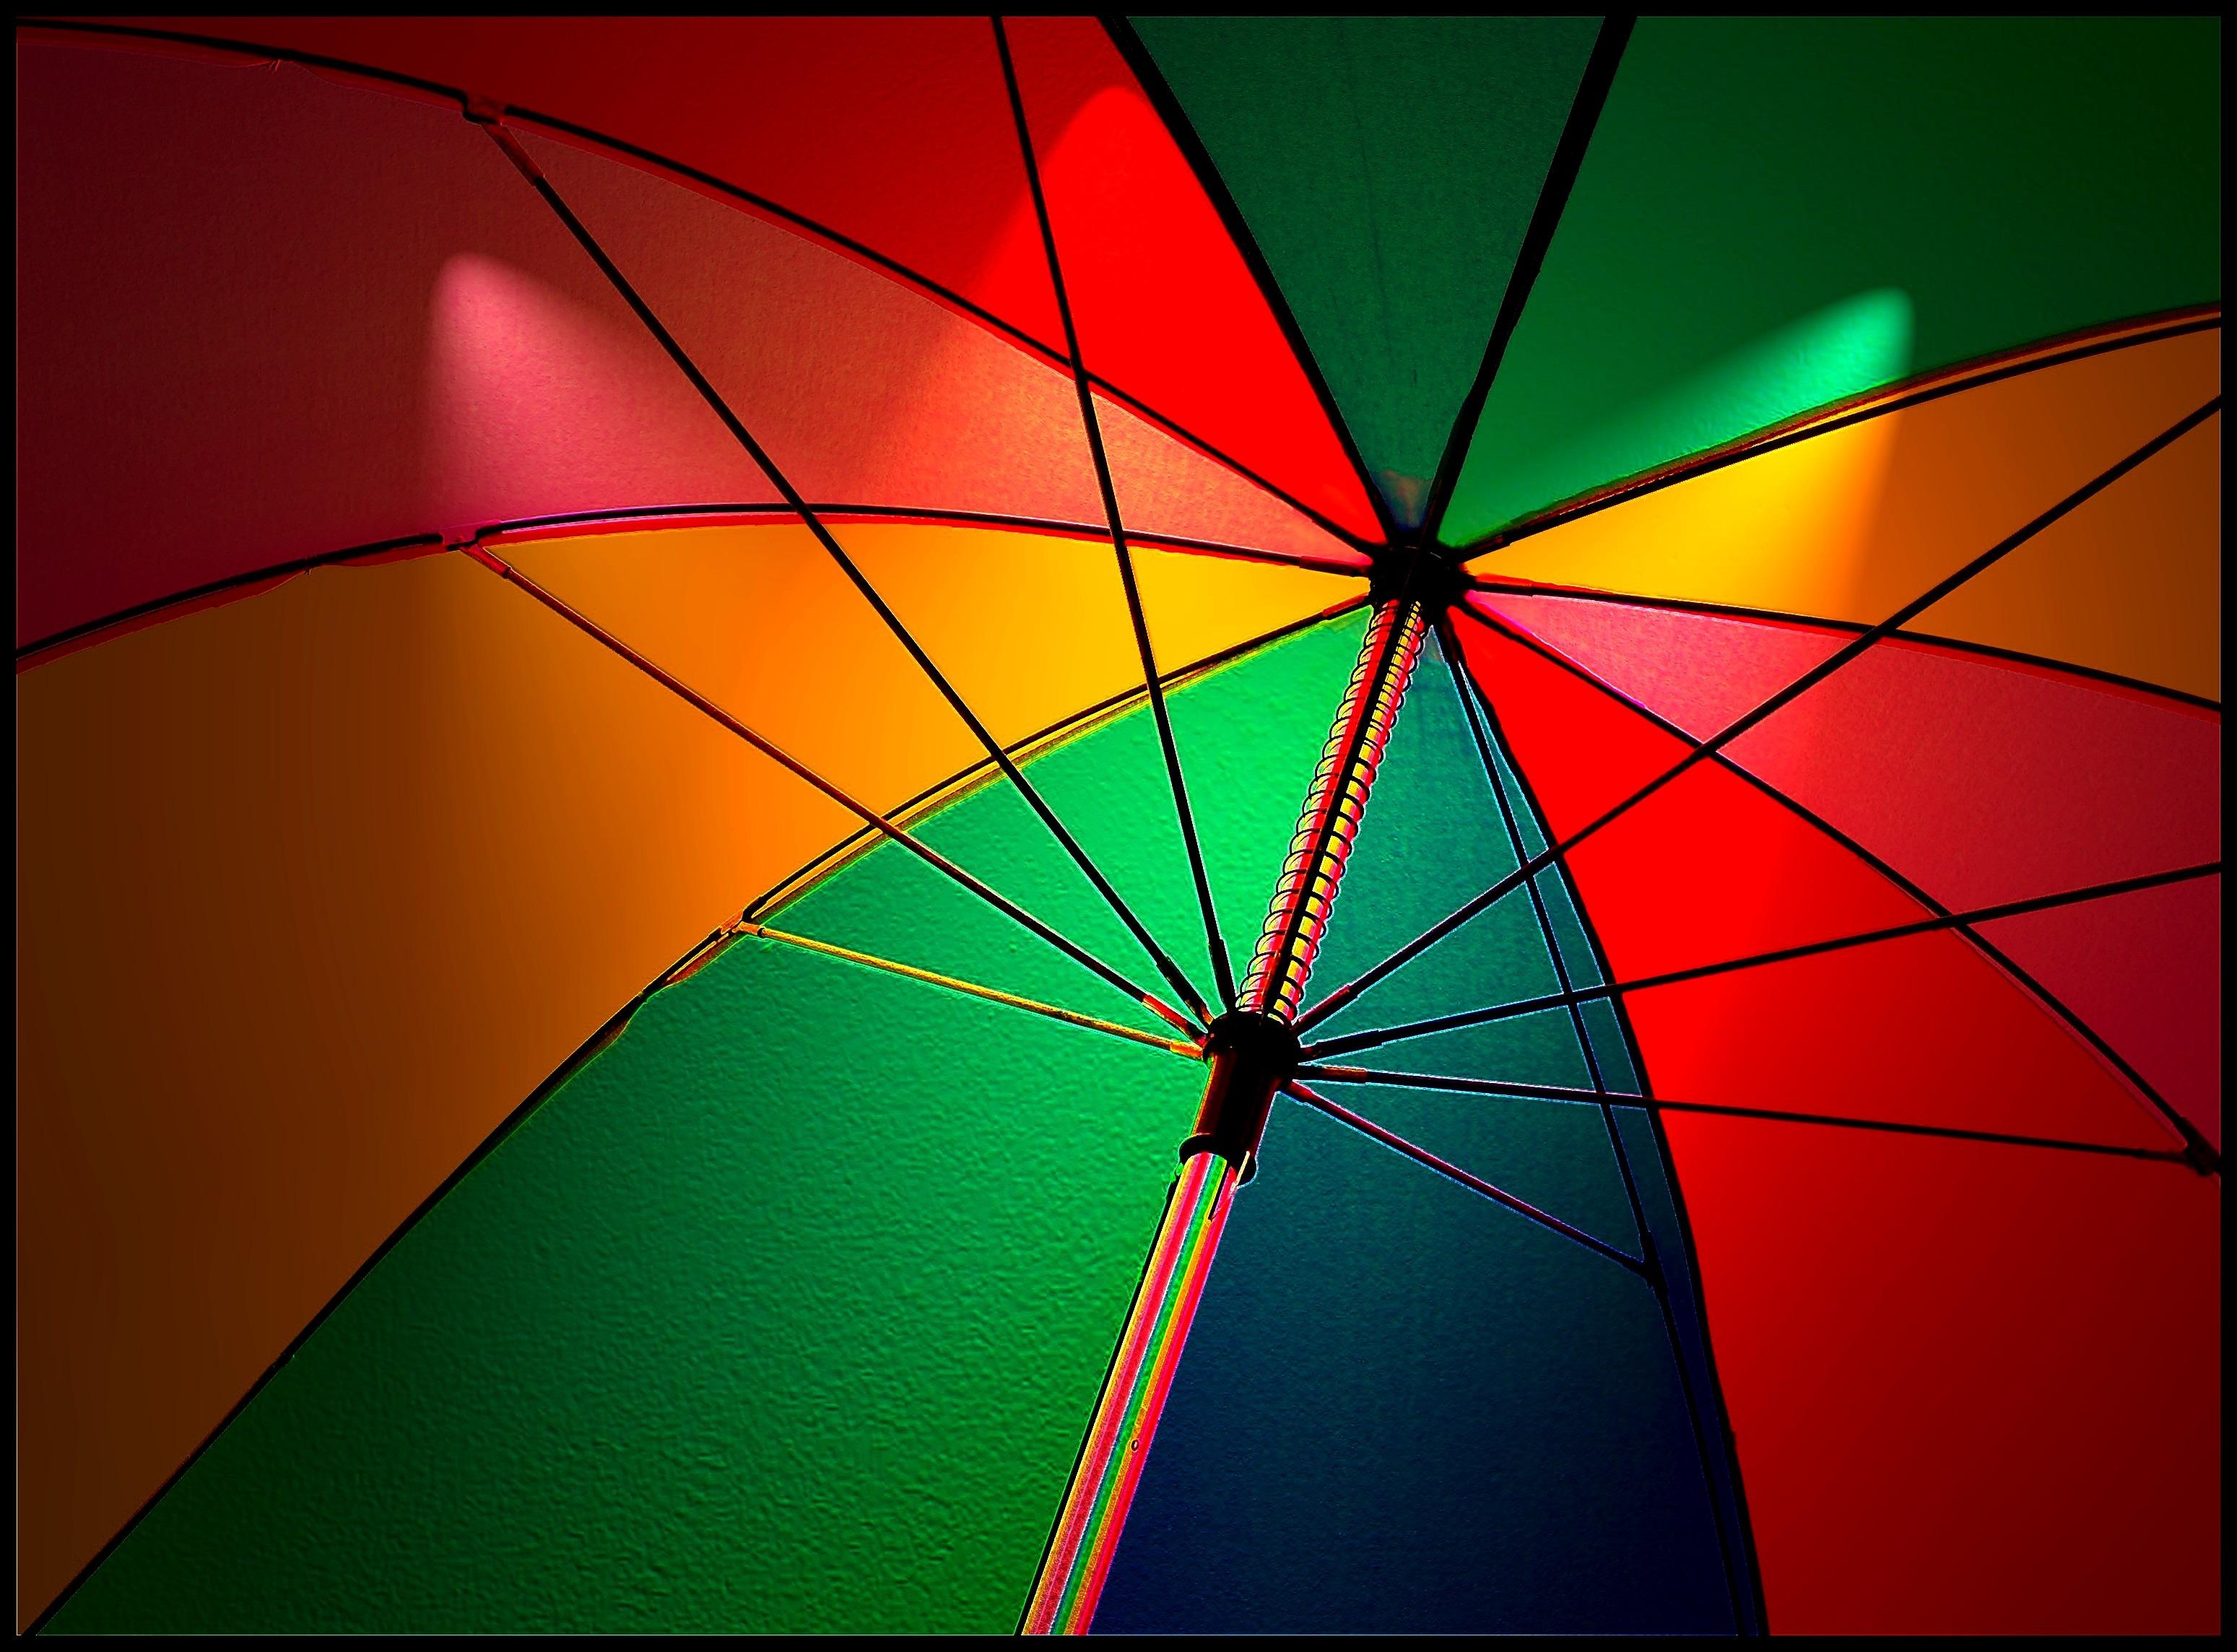 Free Images : screen, light, sky, sunlight, leaf, glass, line, green ...